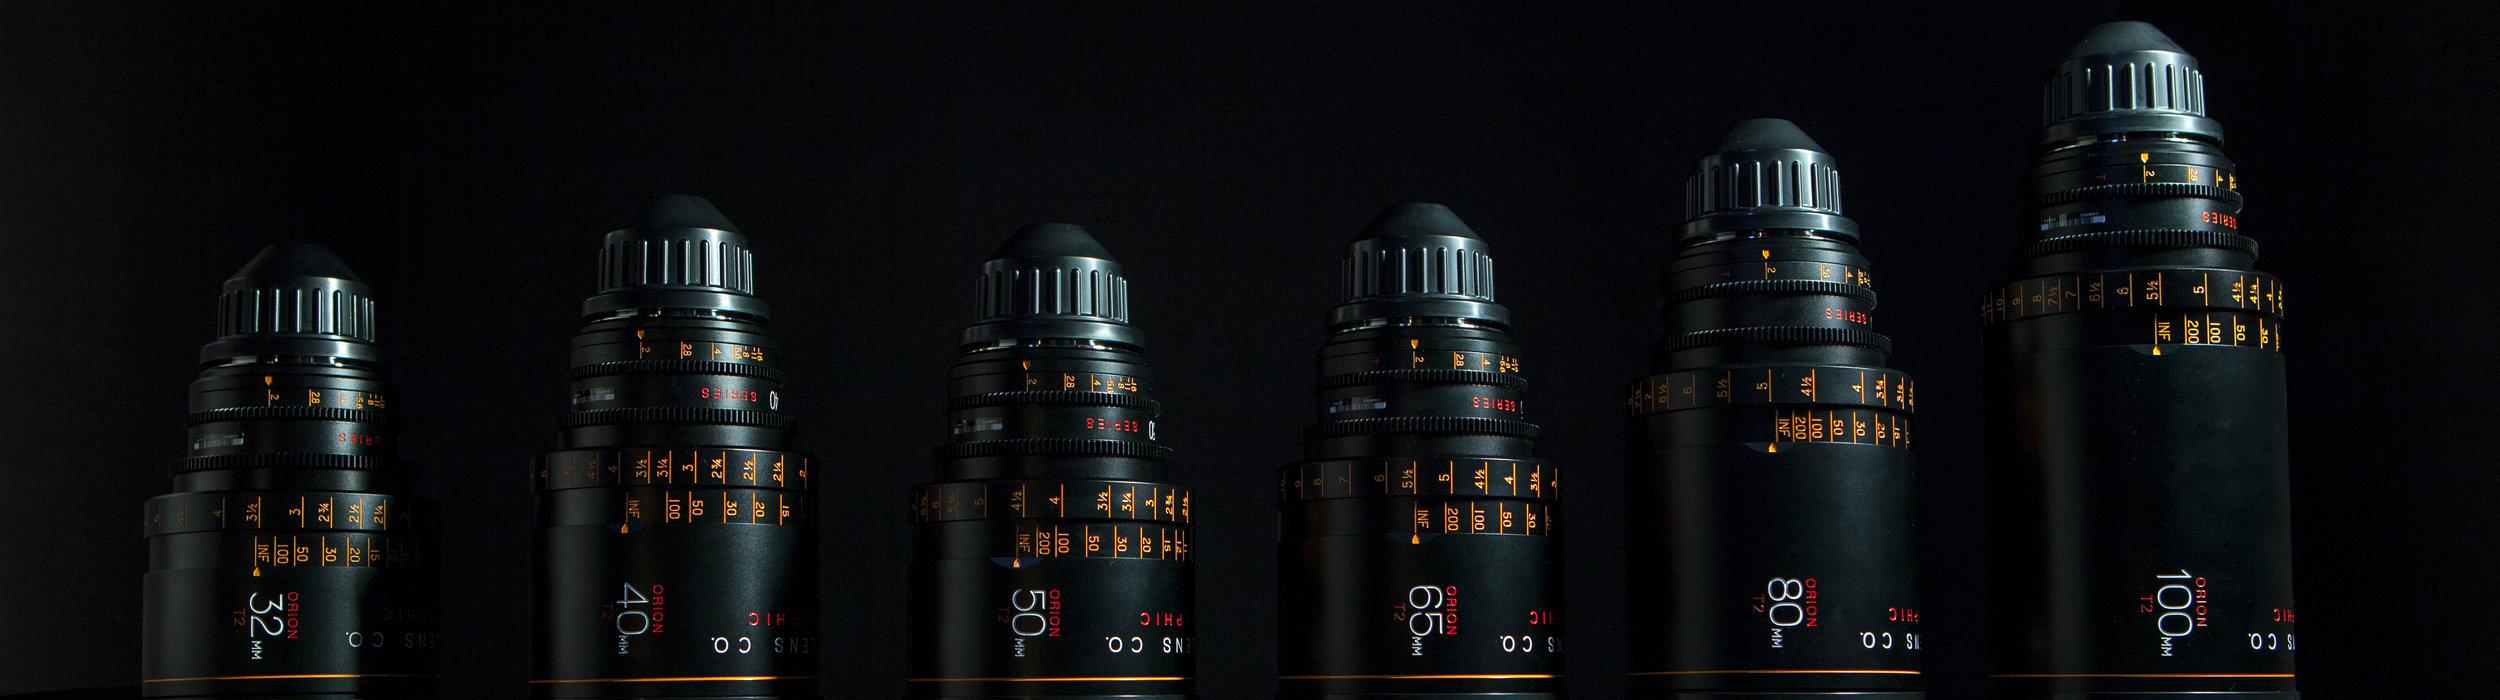 Atlas Orion Anamorphic Primes